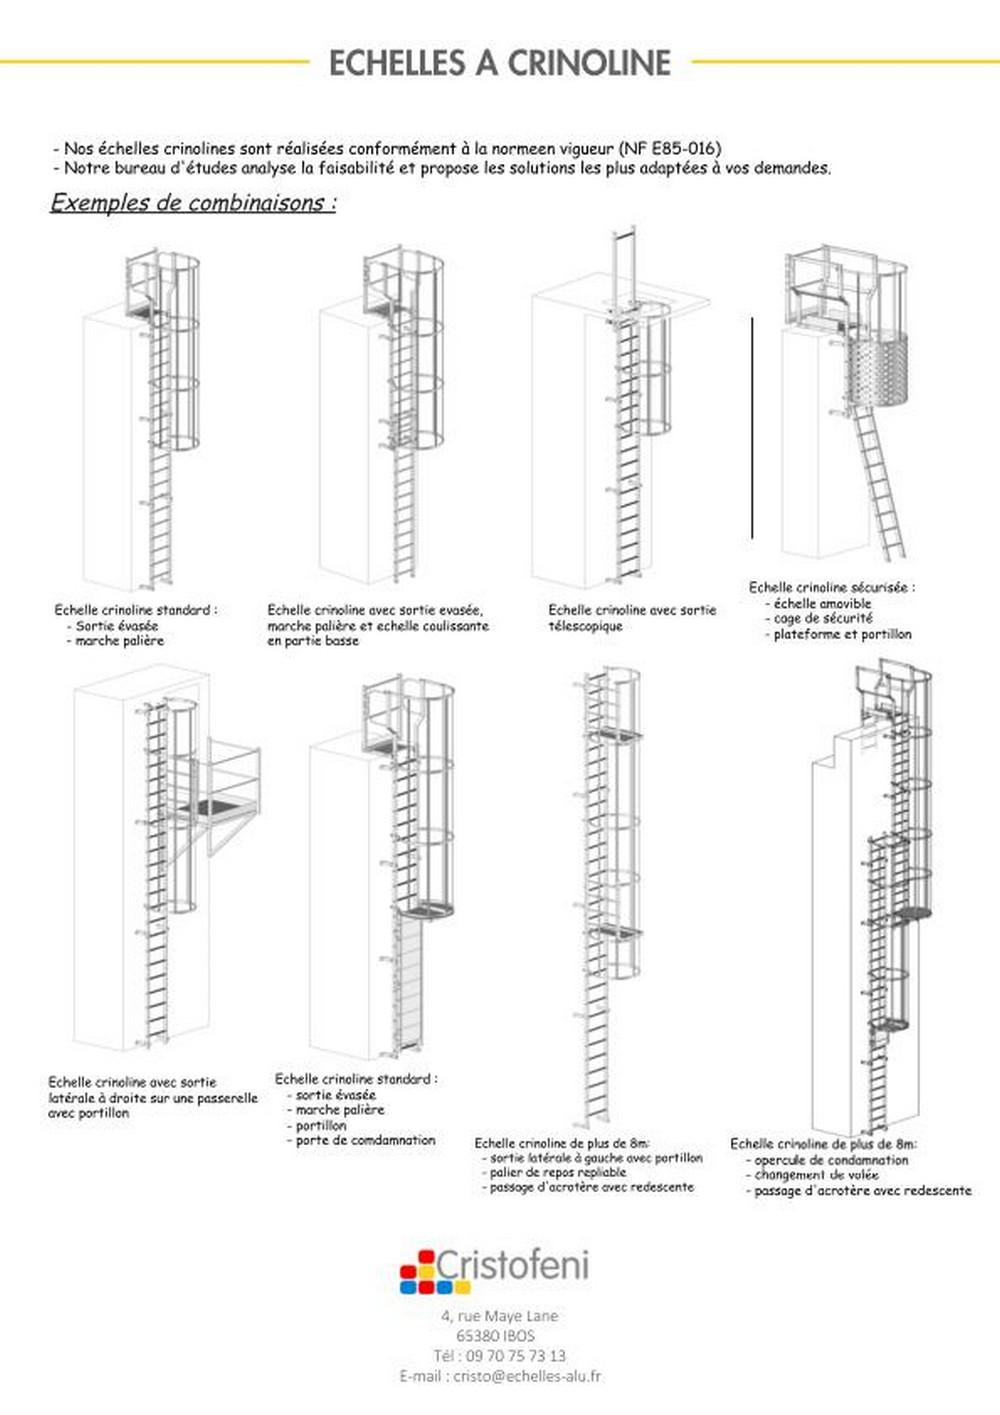 échelle à Crinoline En Aluminium , Crinoline En Acier Galvanisé, Echelle  Crinoline Acier Inoxydable,